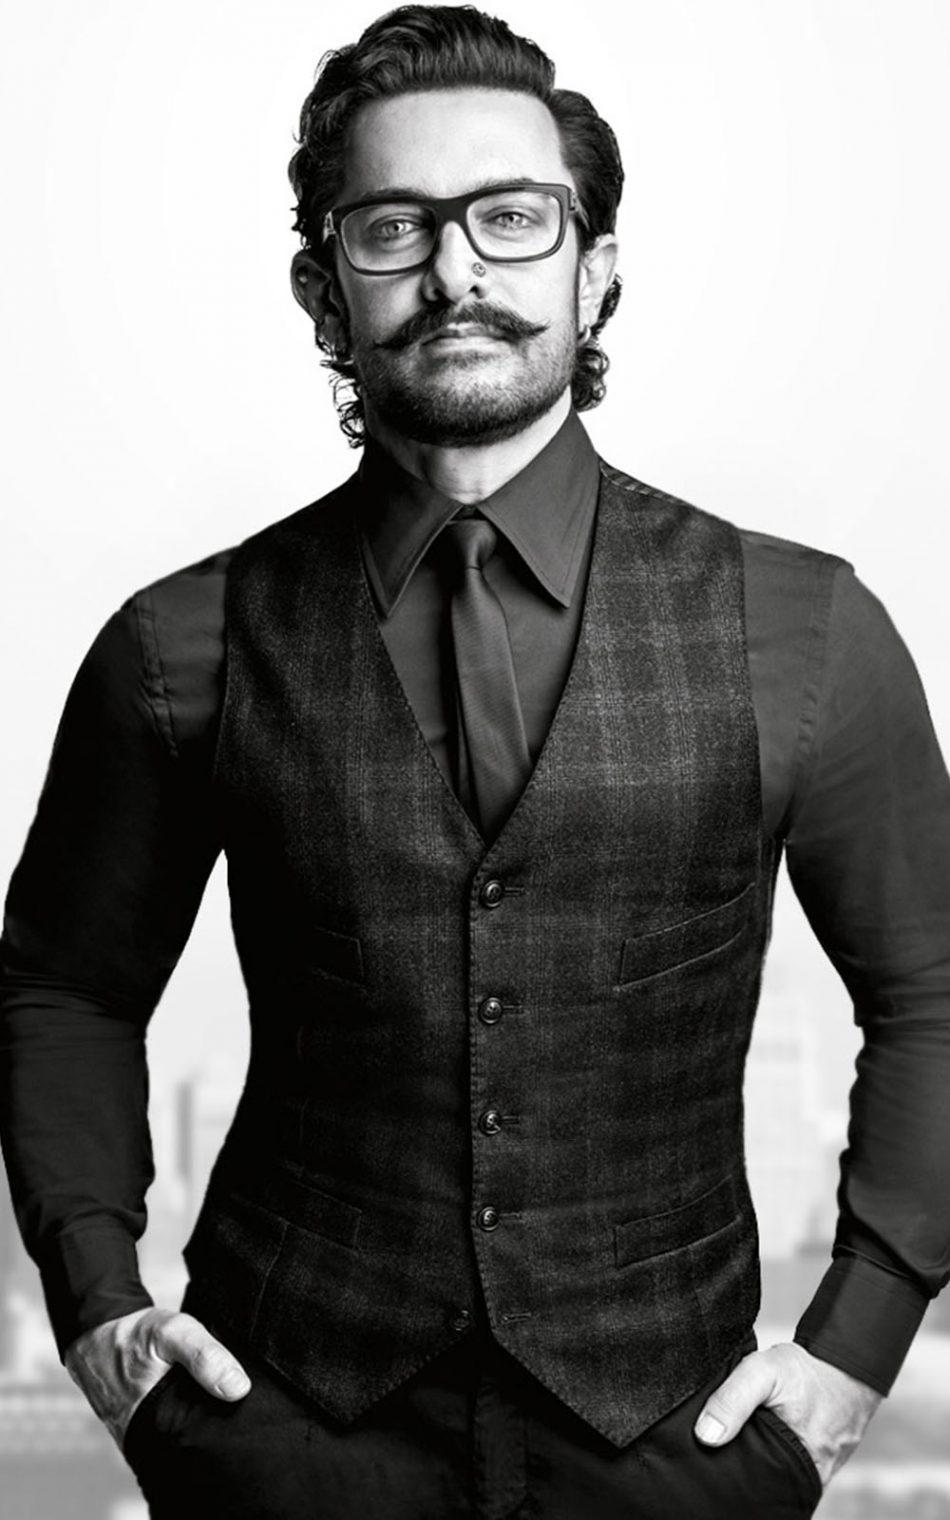 Aamir Khan GQ Magazine Photoshoot HD Mobile Wallpaper